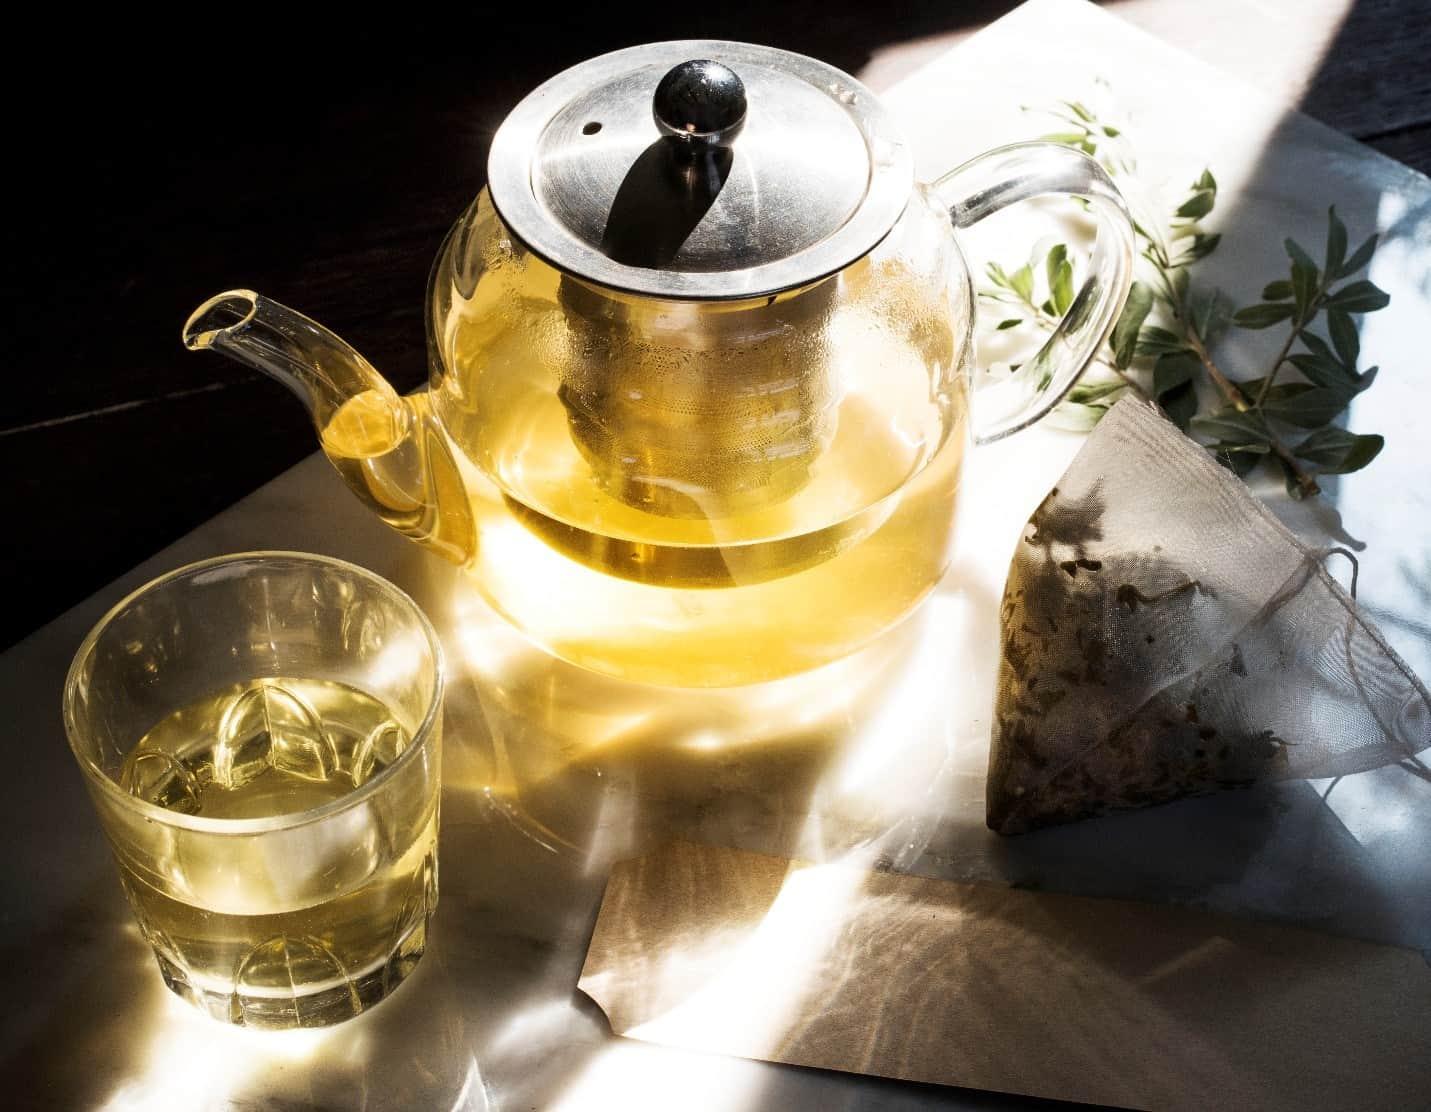 Best Green Tea and Best Green Tea Brands